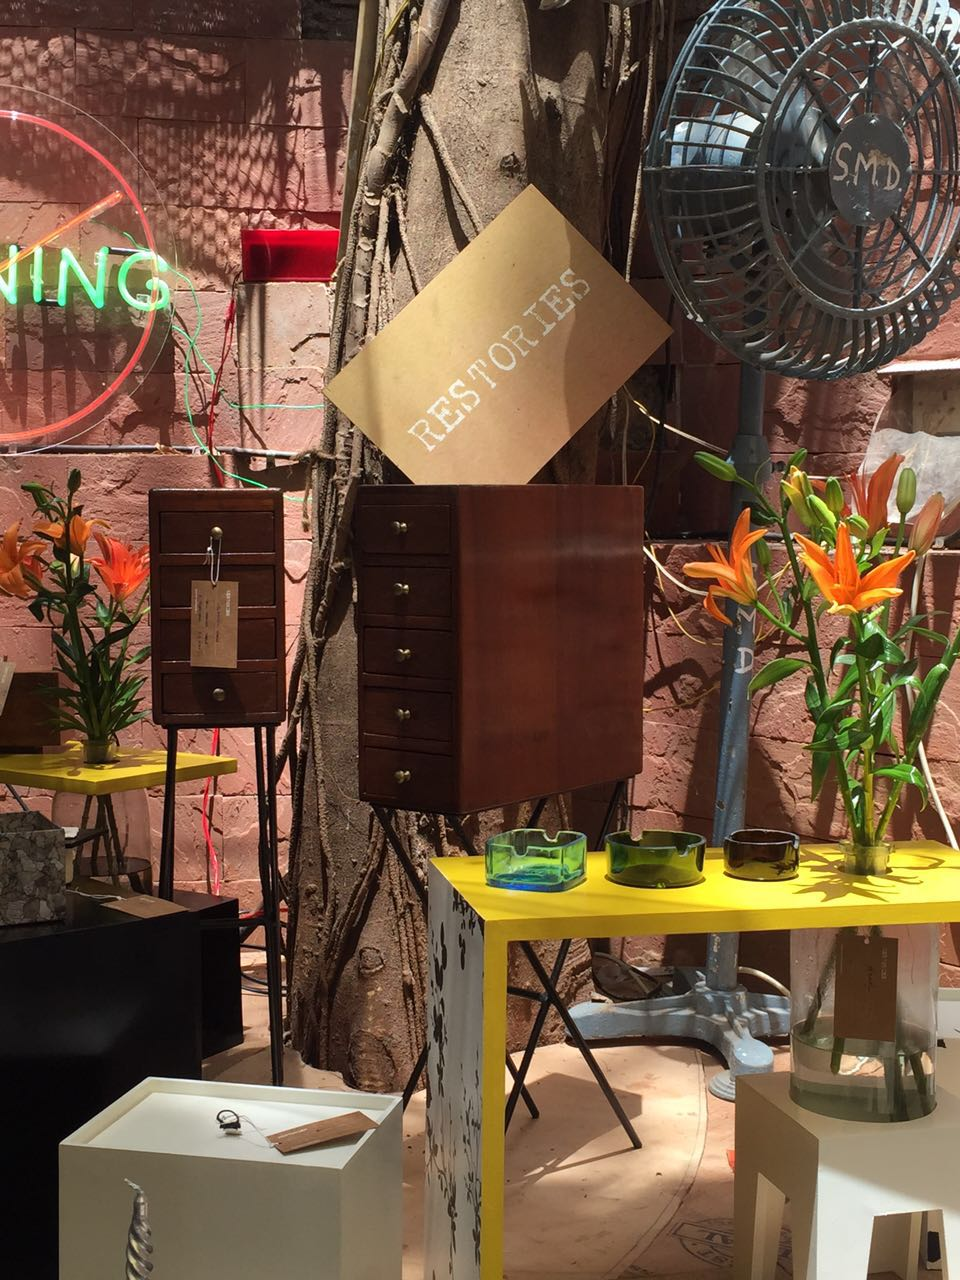 The Vintage Garden | Bandra | Exhibition | 2016 | Ratna Gupta | Restories | Upcycling the ordinary into the extraordinary | Recycle | Product Design | Creative | Mumbai | People